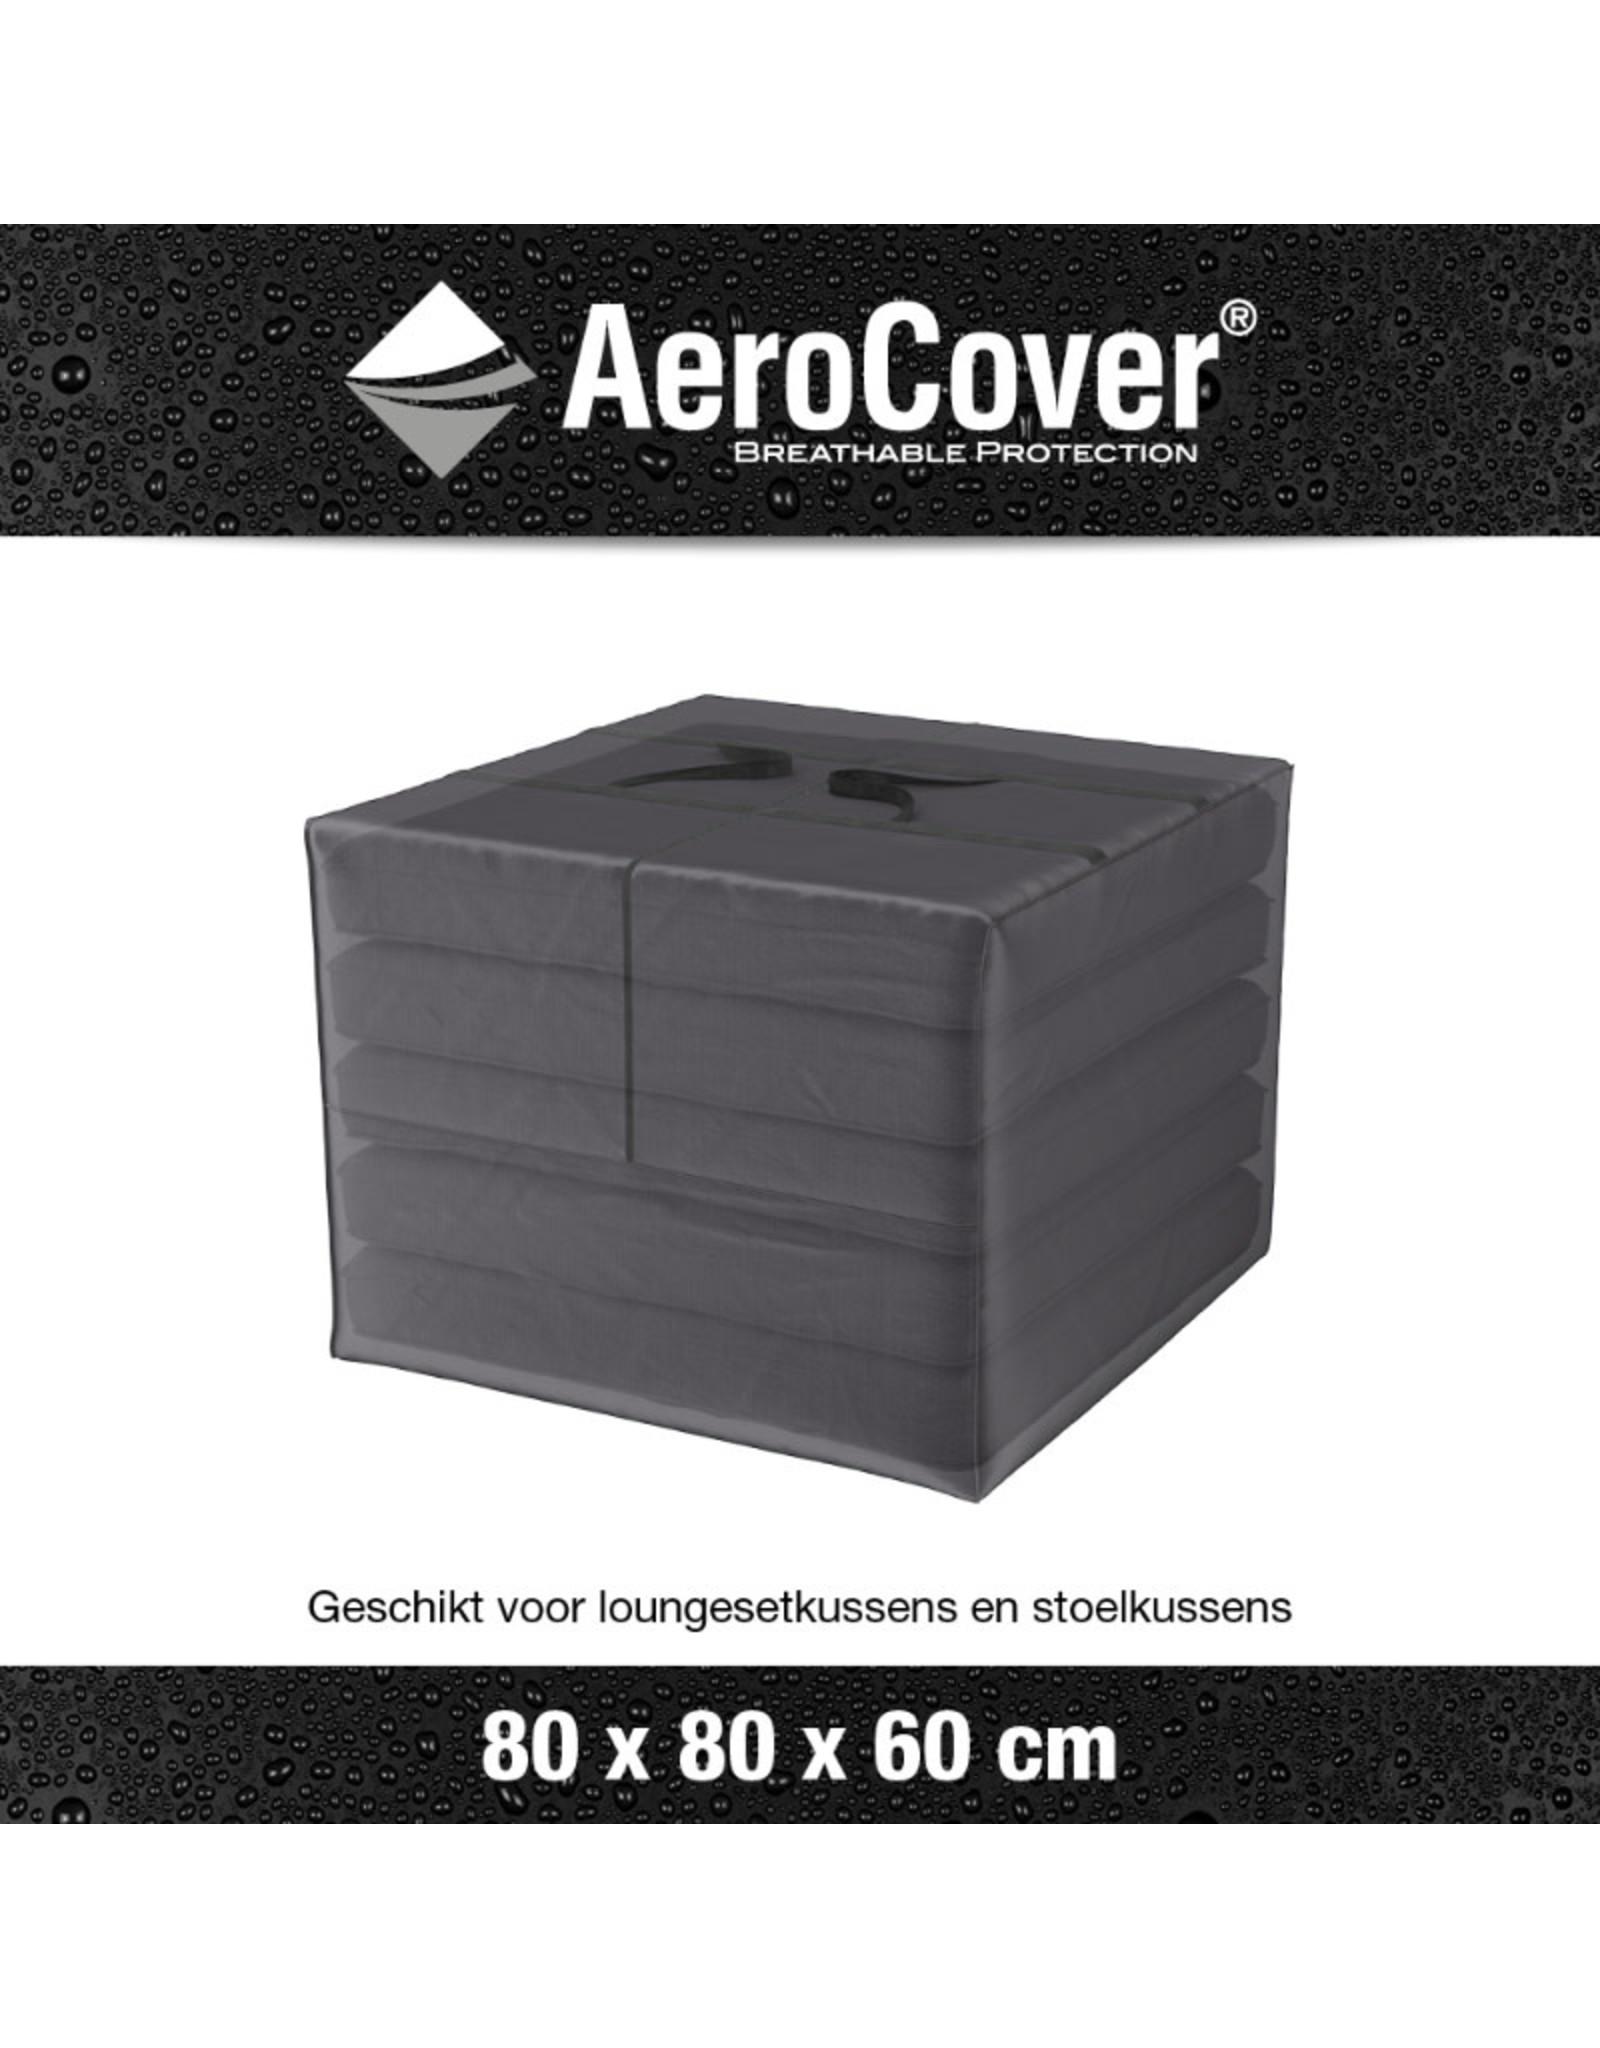 Aerocover AeroCover Kussentas 80x80xH60